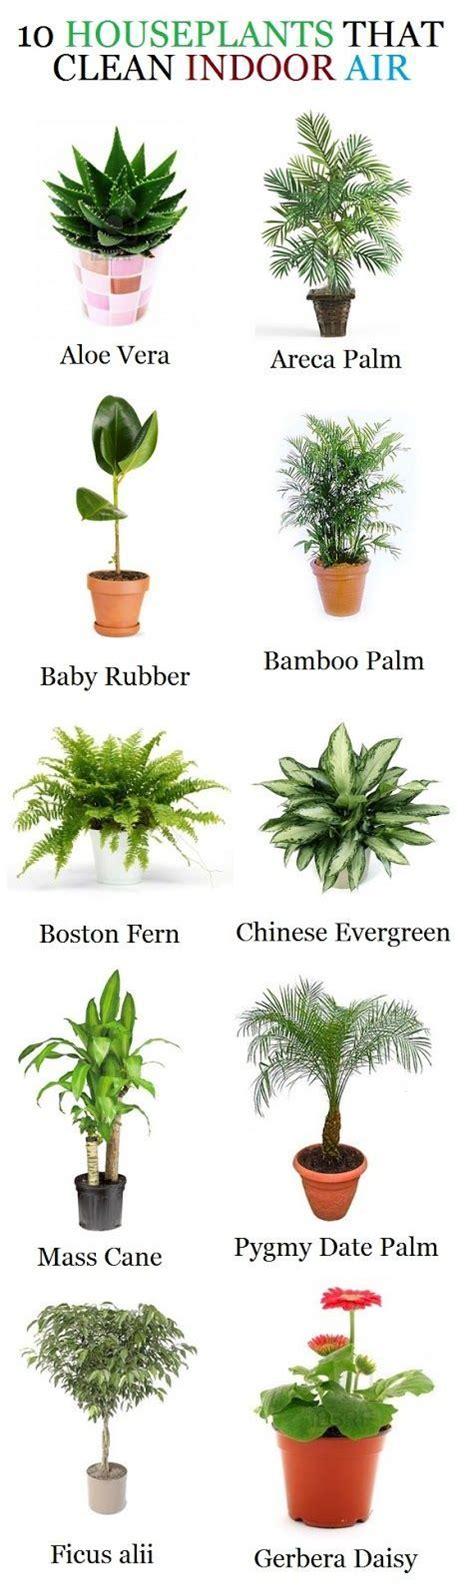 good houseplants alternative gardning 10 houseplants that clean indoor air